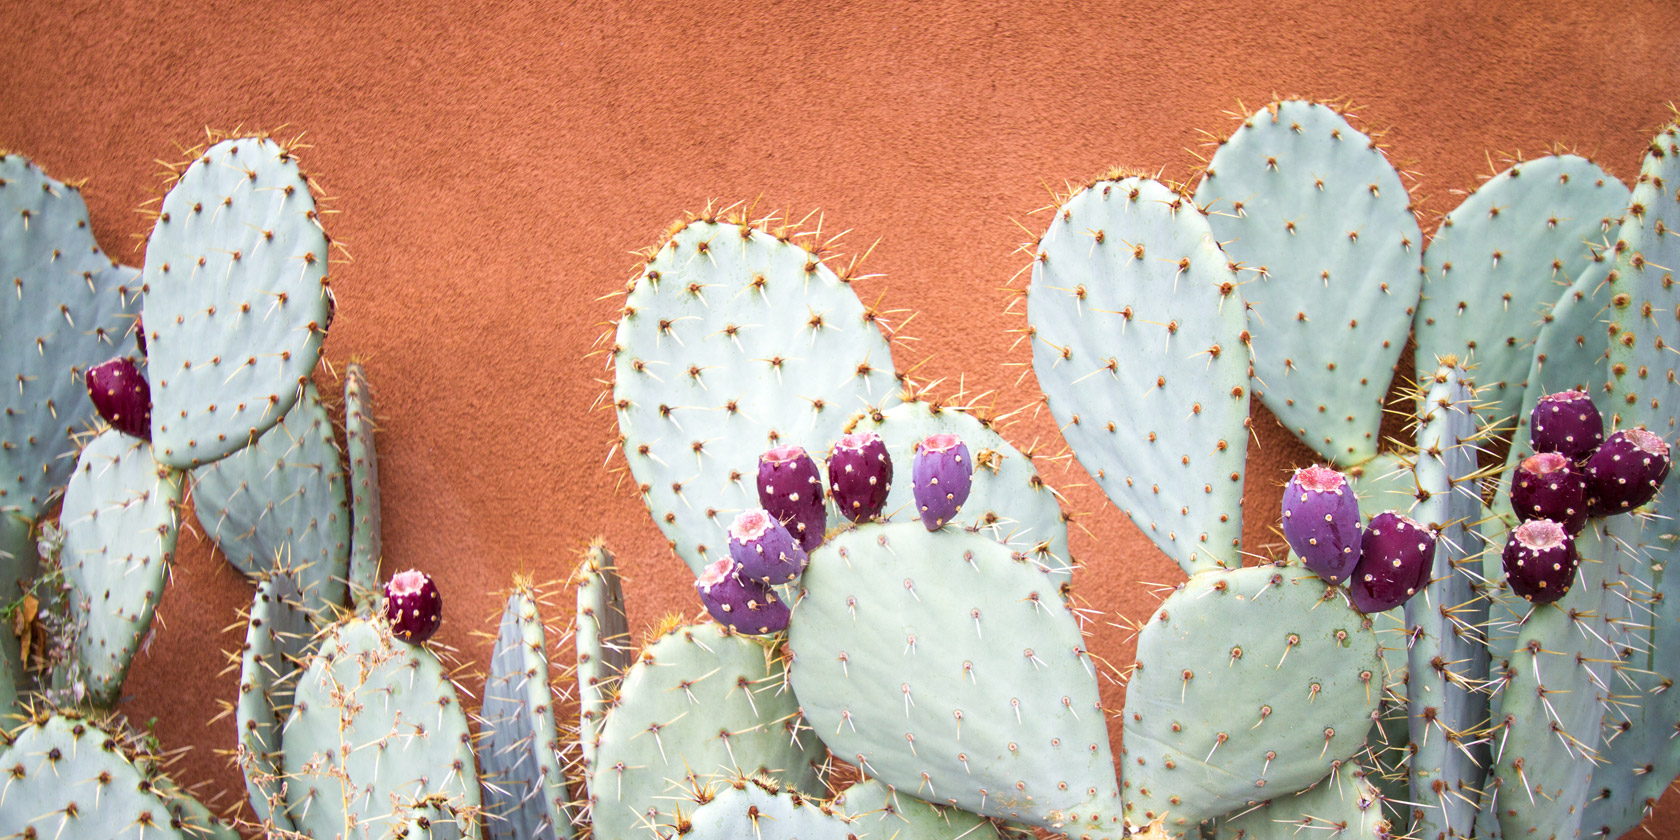 kaktuswasser